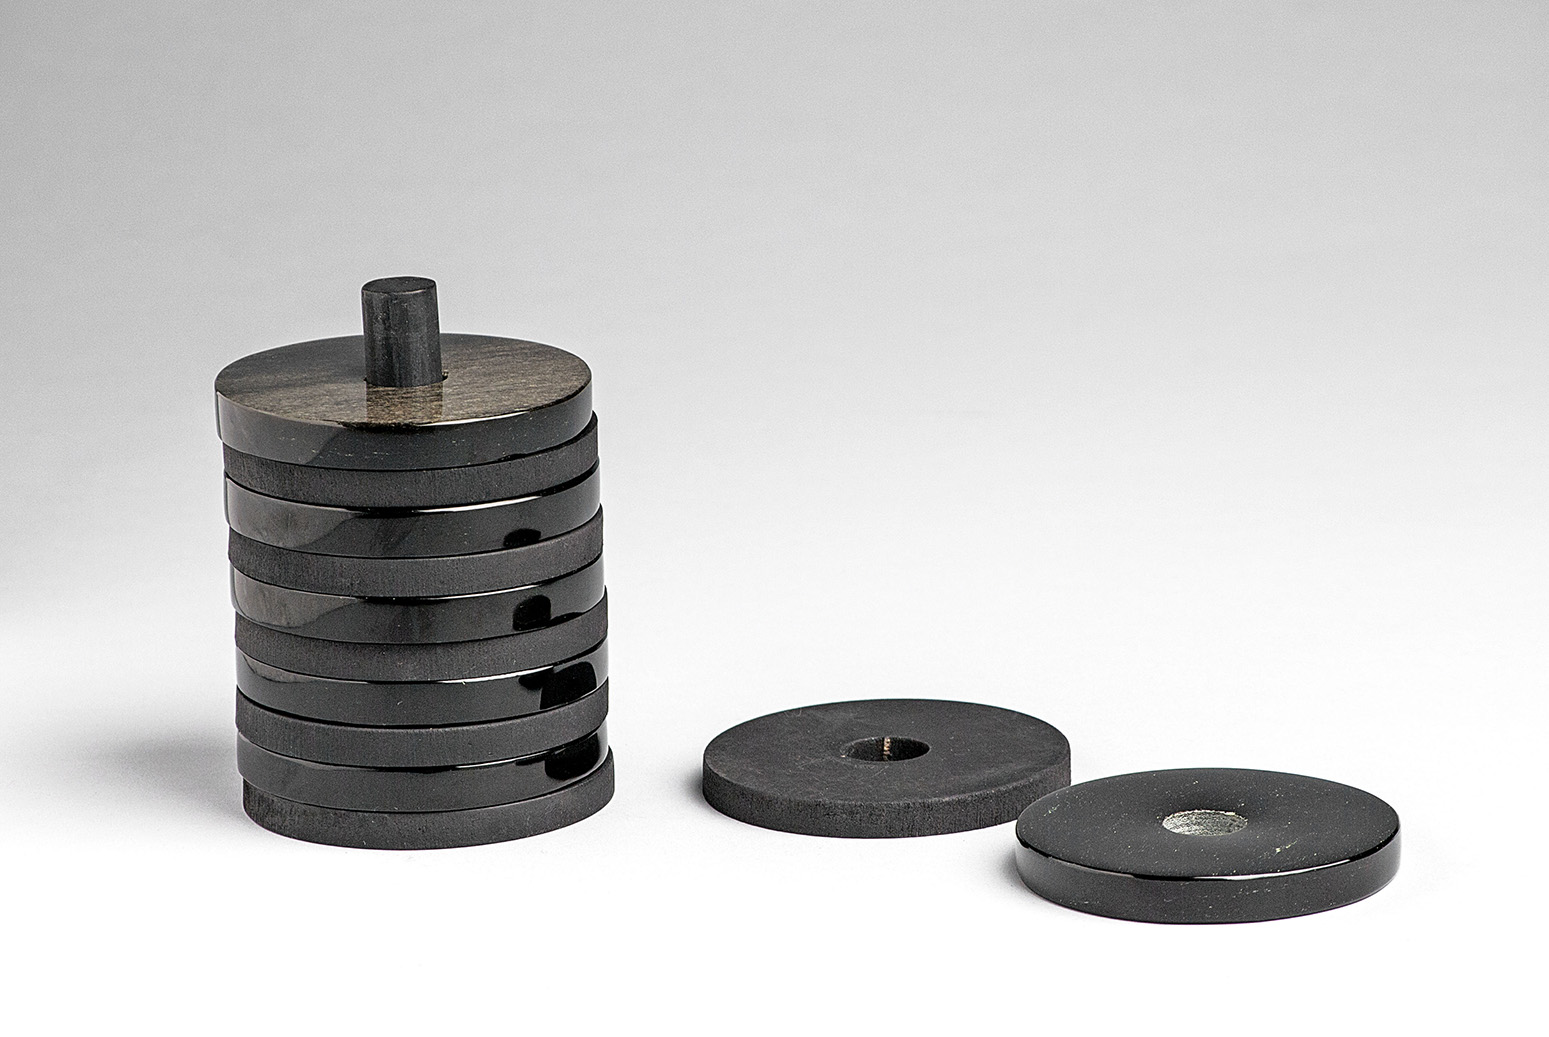 Obsidian-coasters-design-RicardoSalas-artisan-Daniel-Juarez-Disciplina-Anahuac-MarionFriedmann-MexicoDesignTime7.jpg